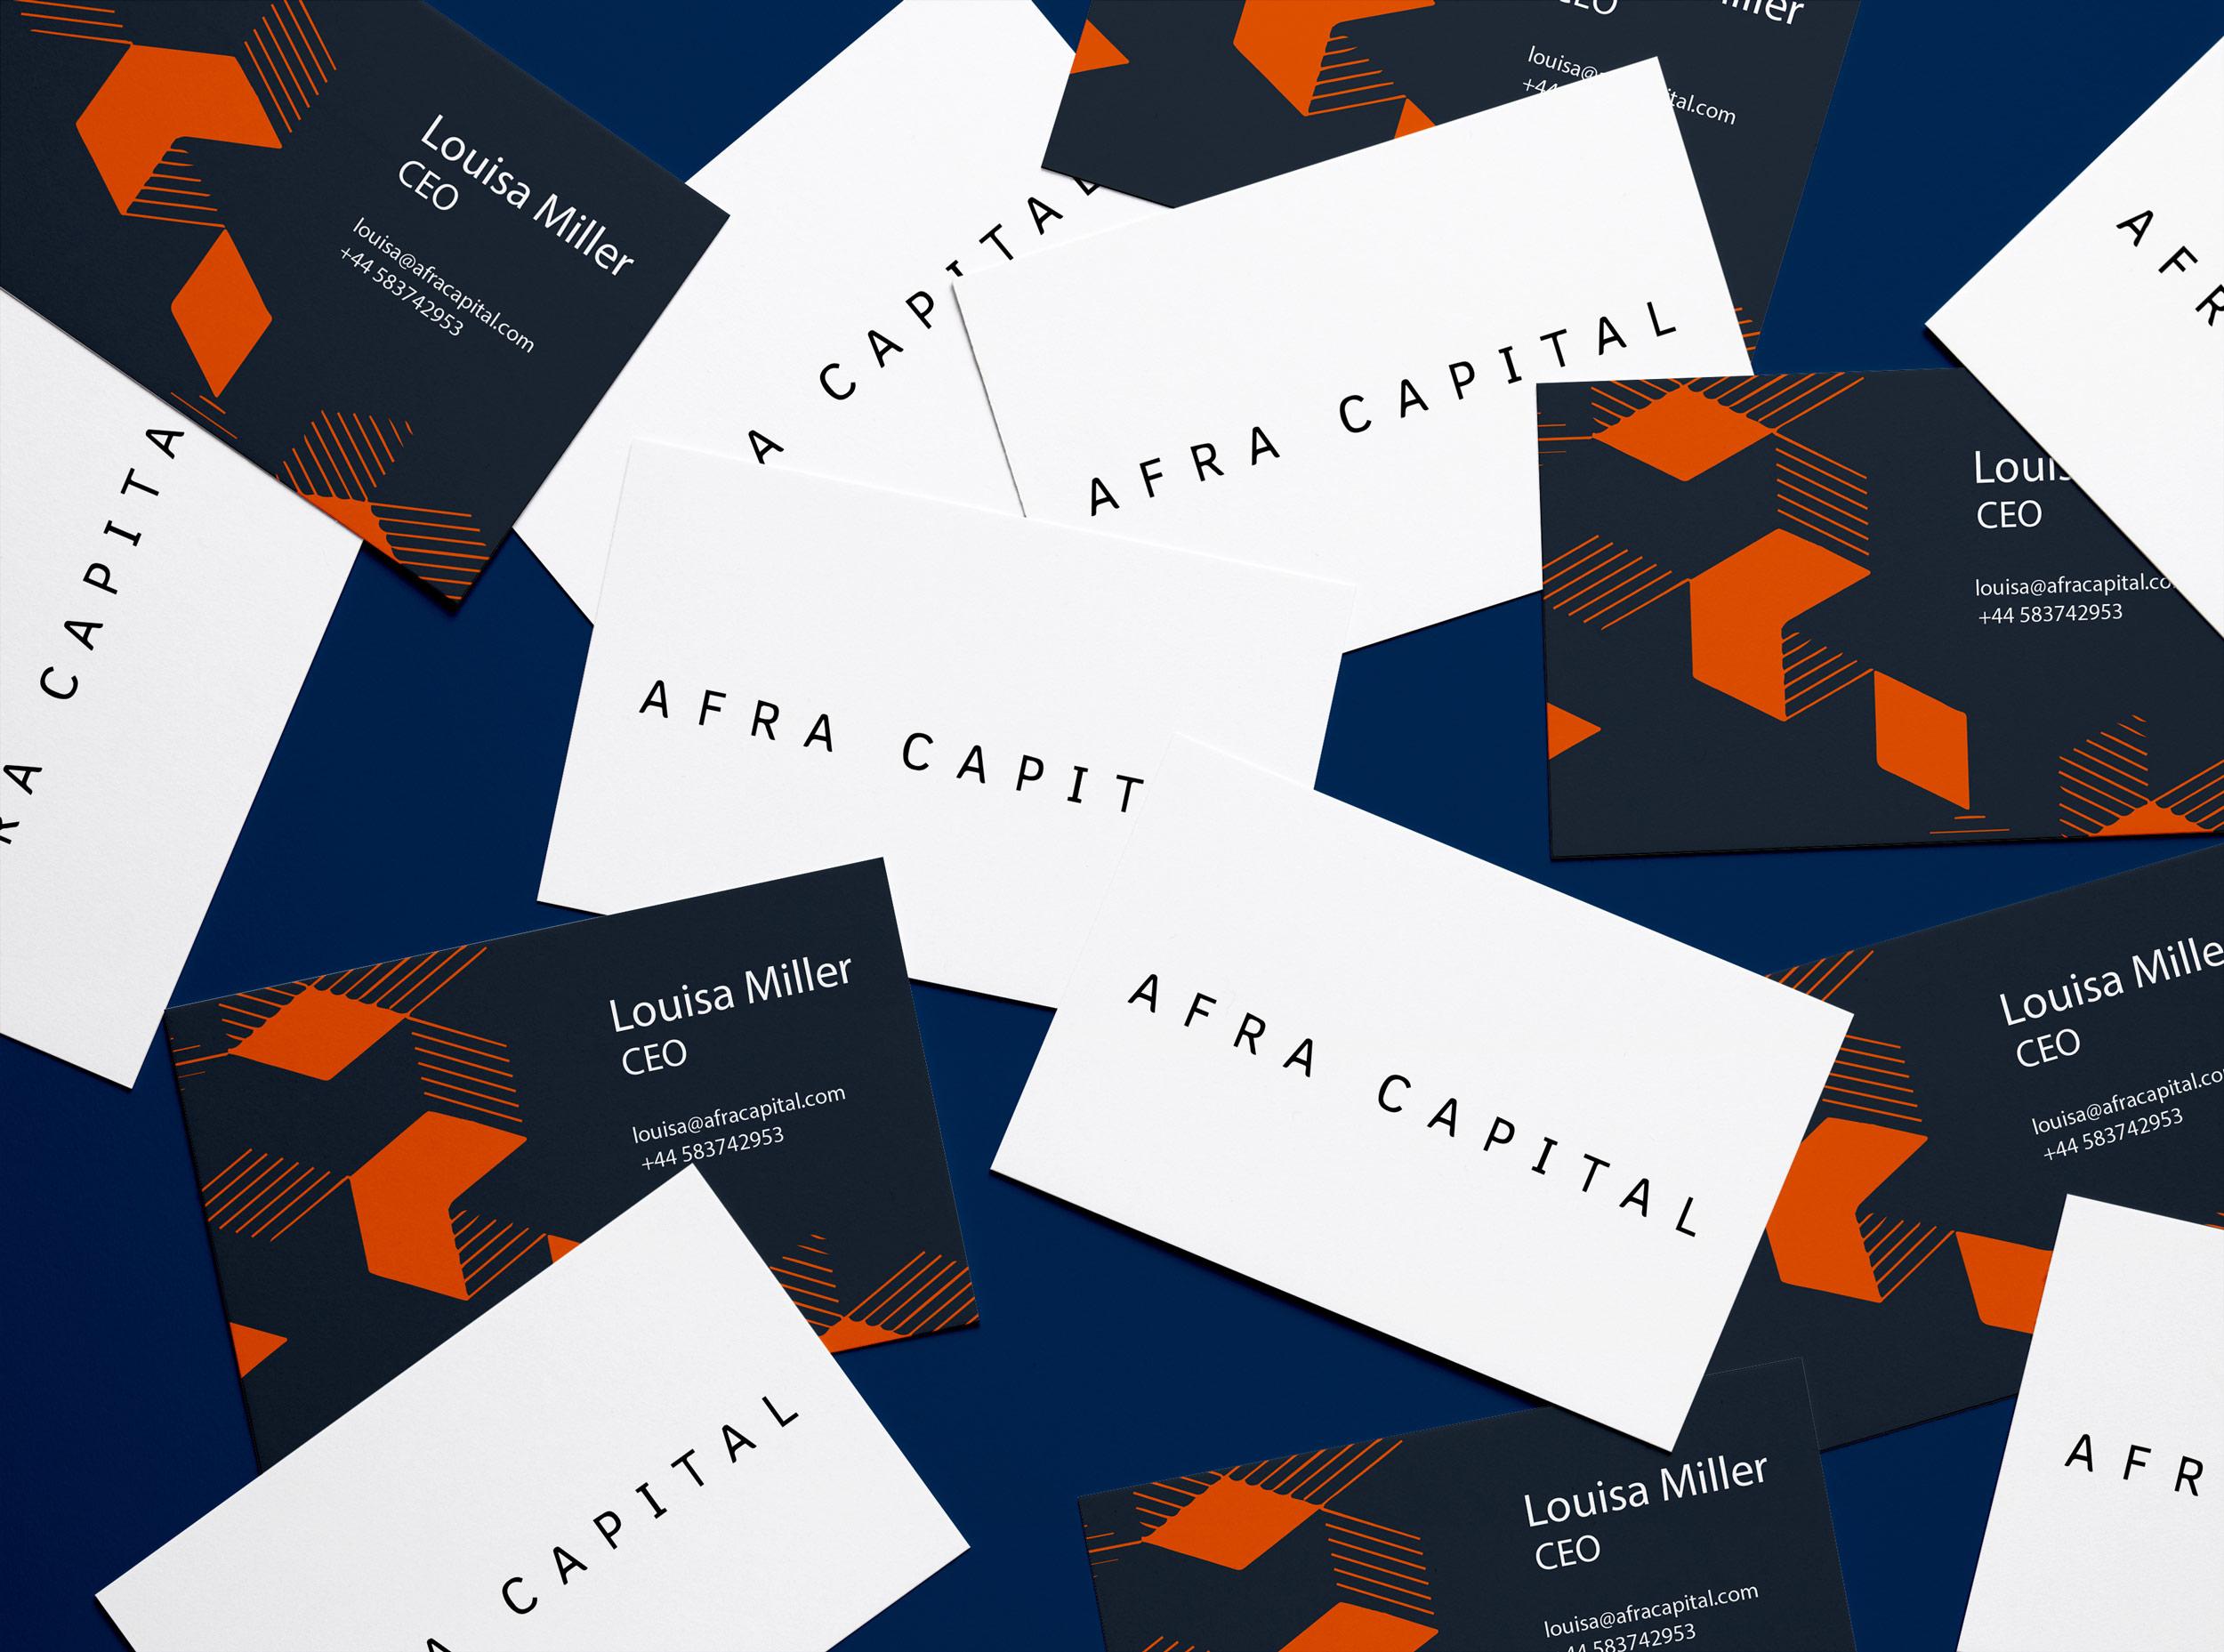 Afra Capital Business Cards